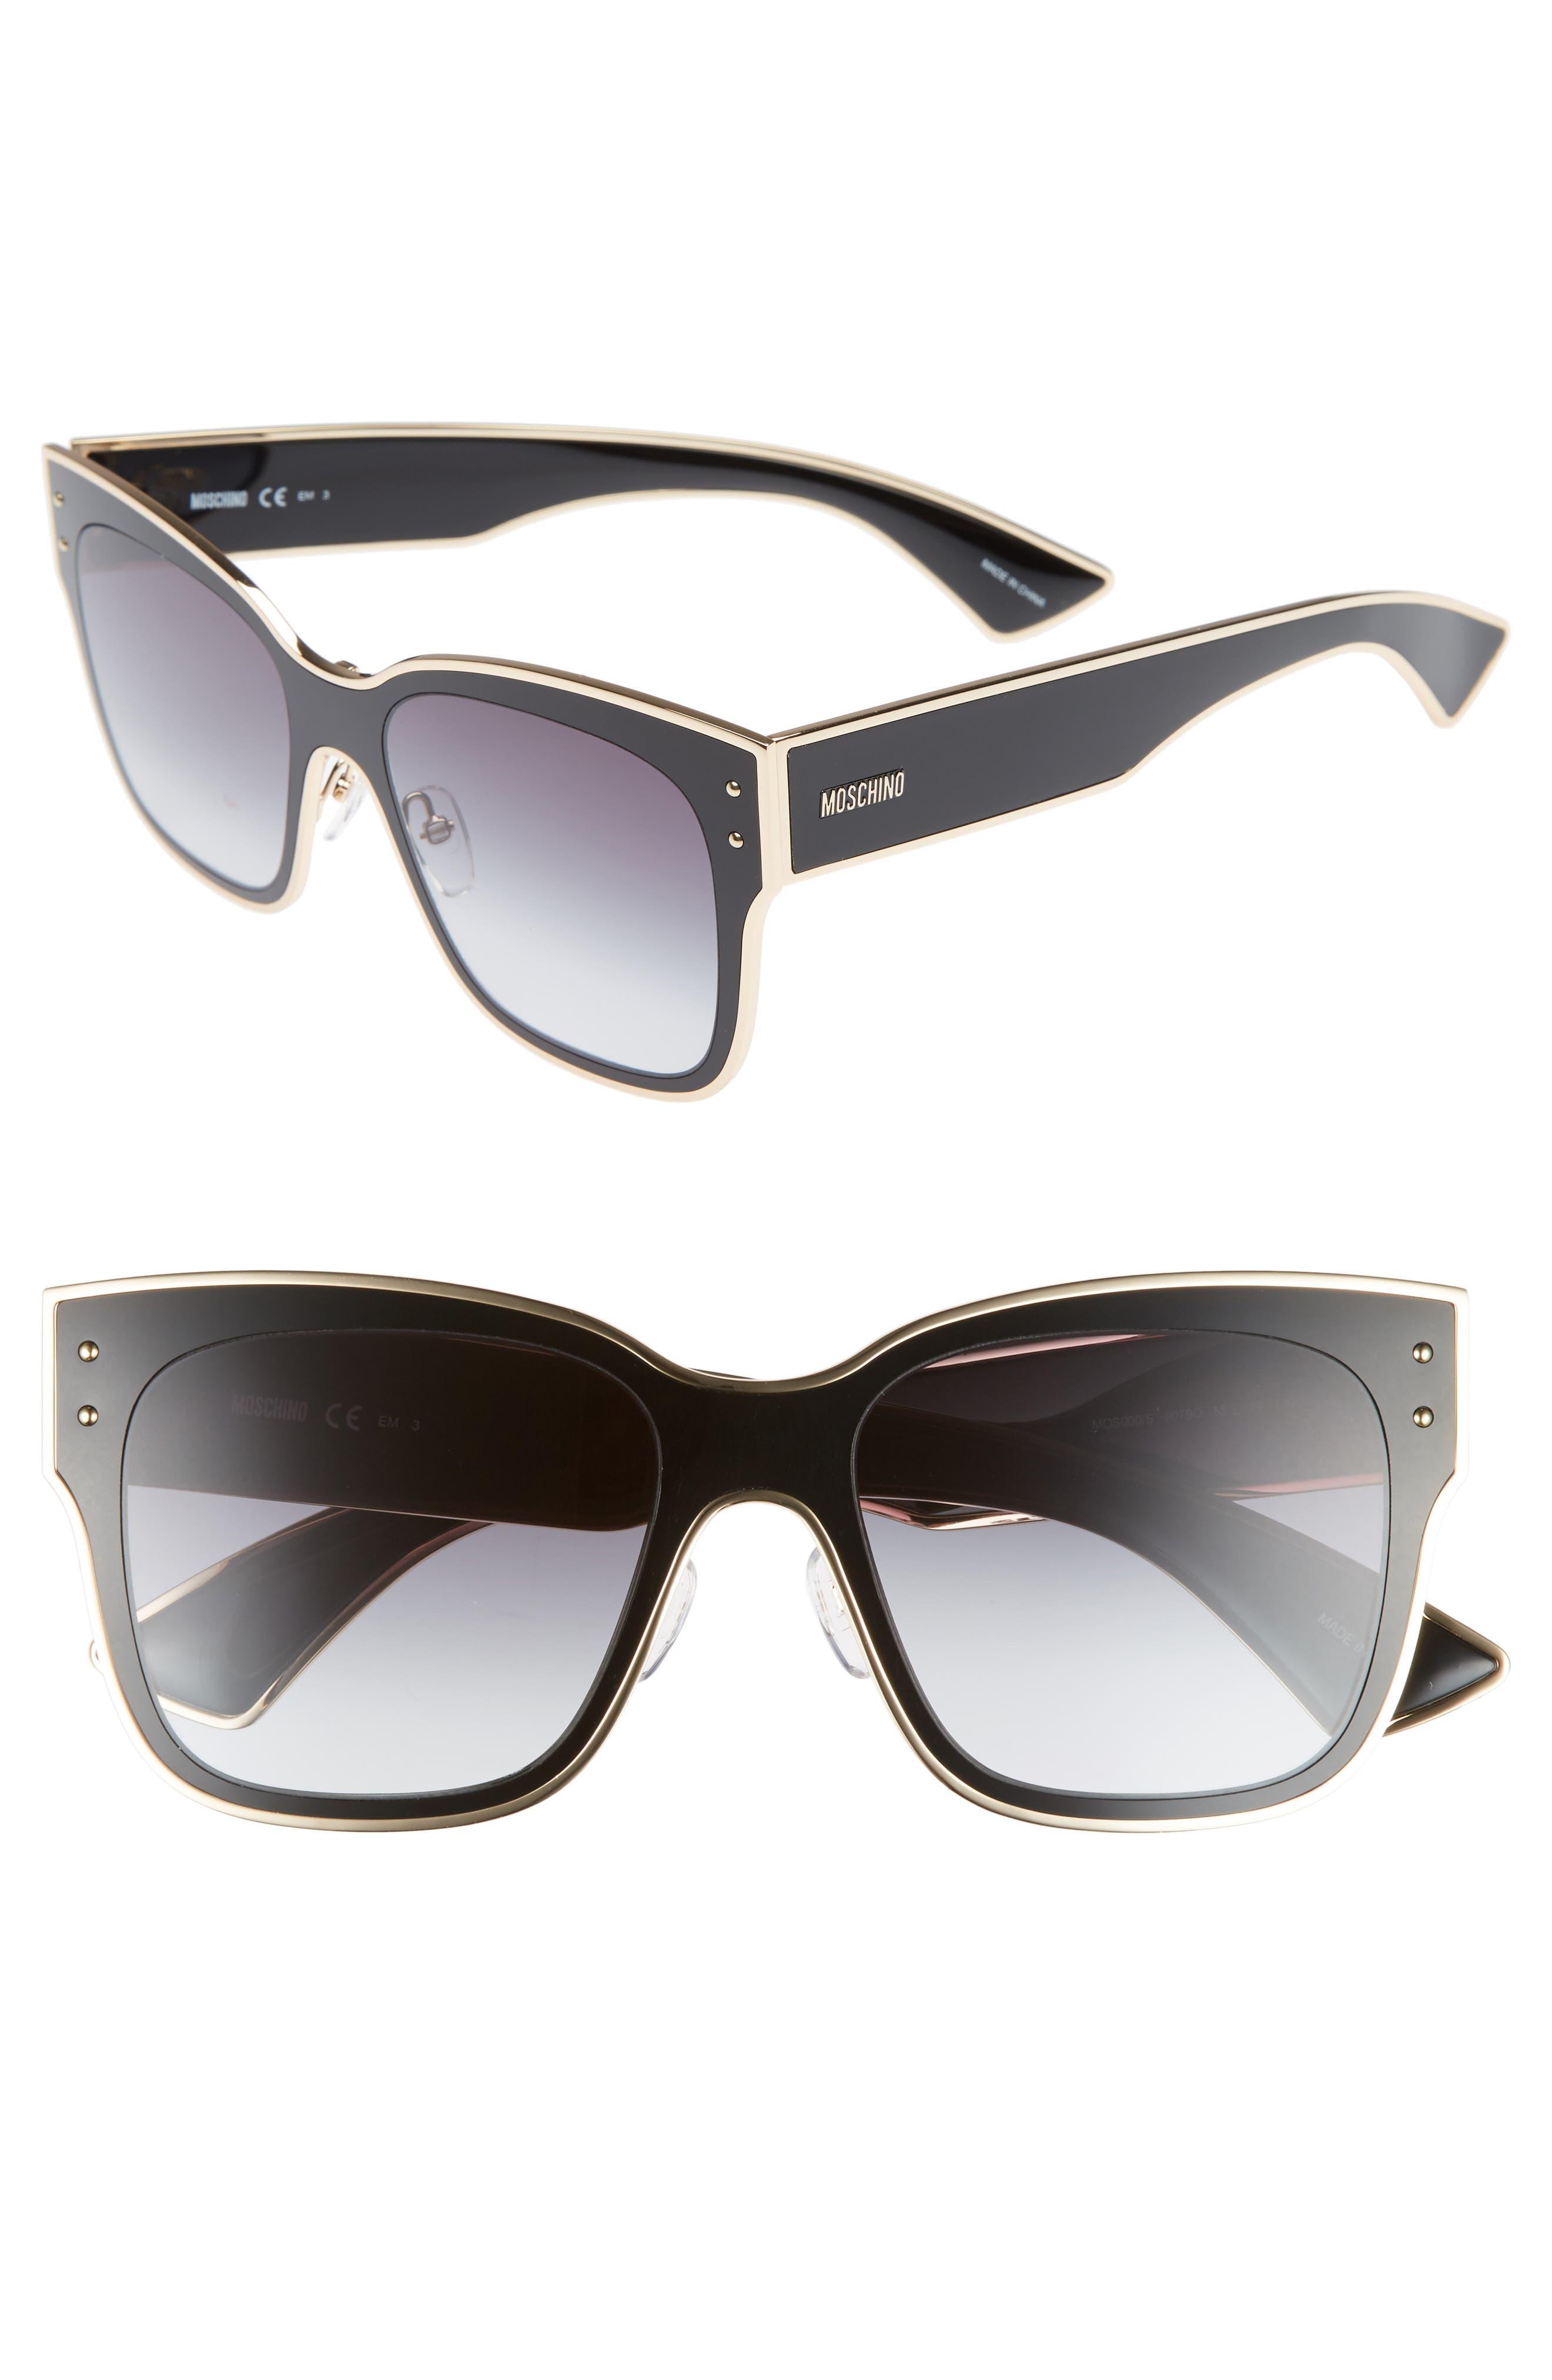 55mm Cat Eye Sunglasses,                             Main thumbnail 1, color,                             BLACK